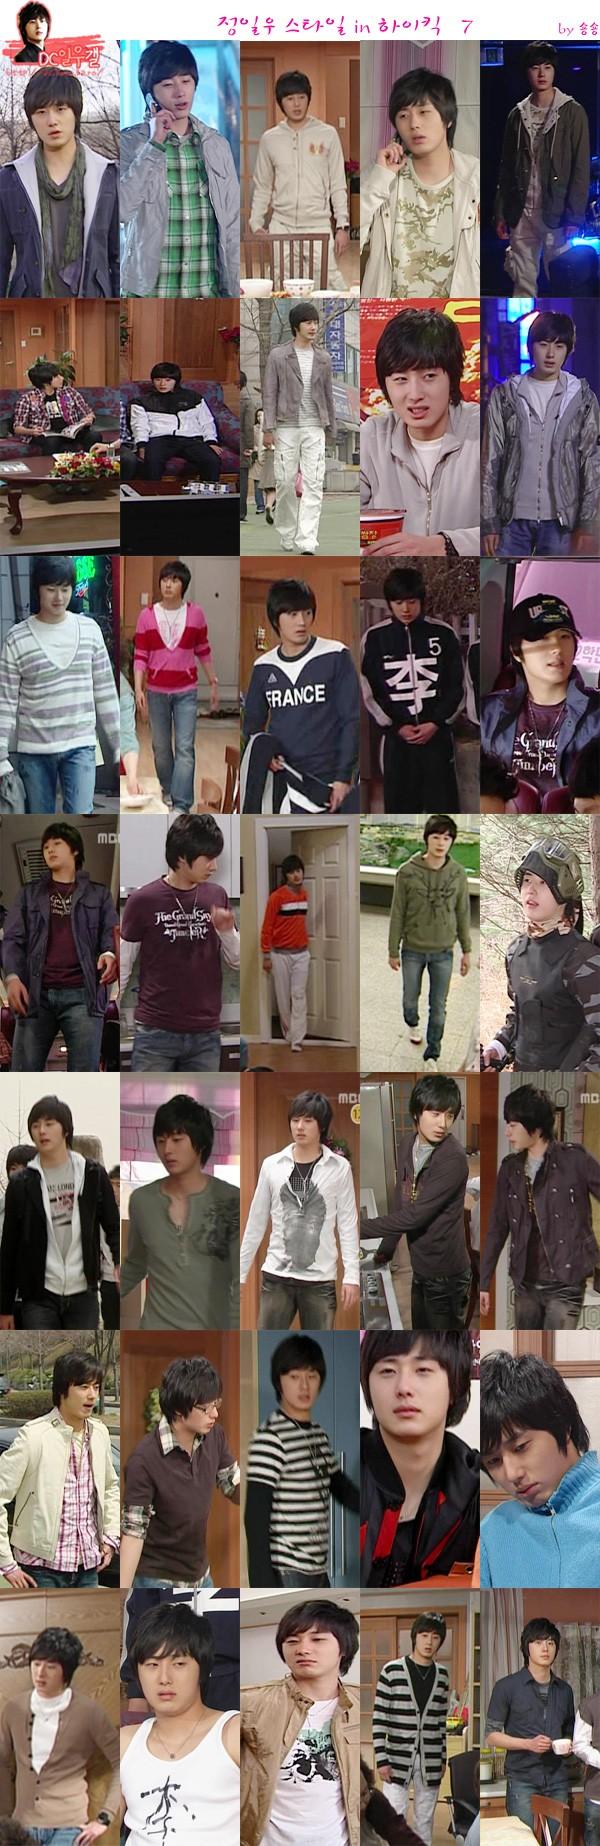 2007 JIW Collage 4